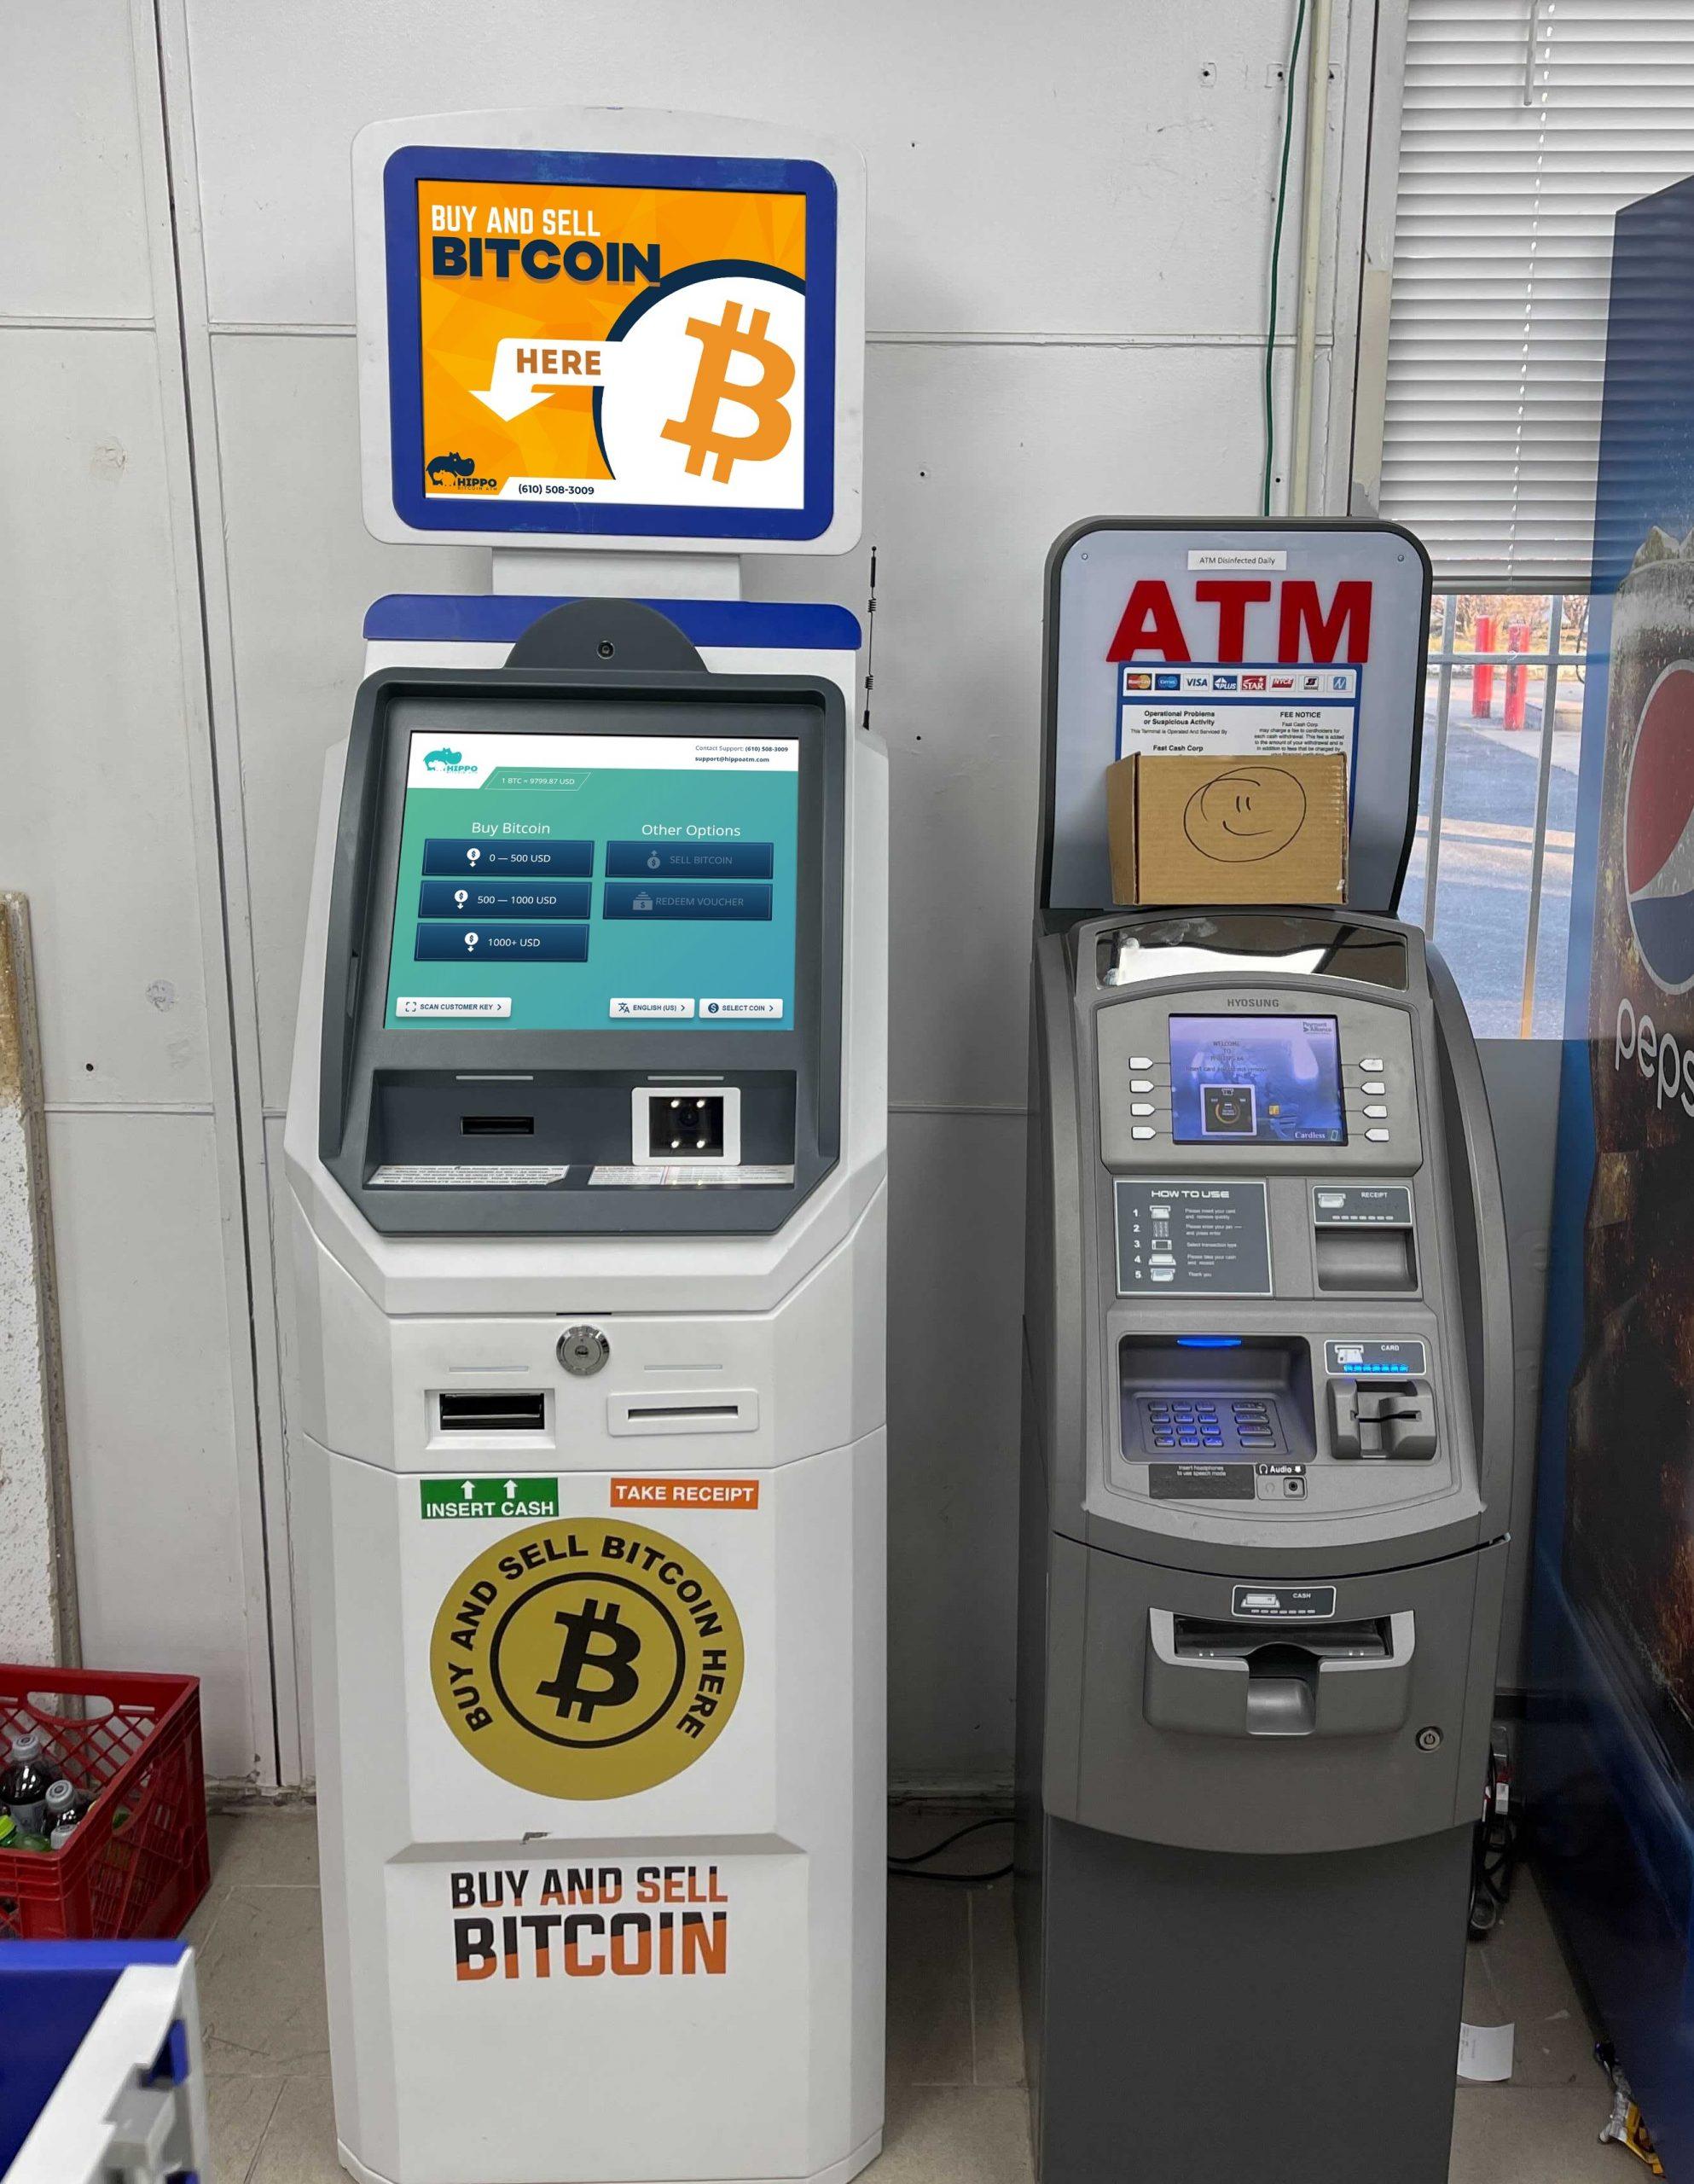 Bitcoin ATM Denver PA 2194 North Reading Road Denver Hippo Kiosks